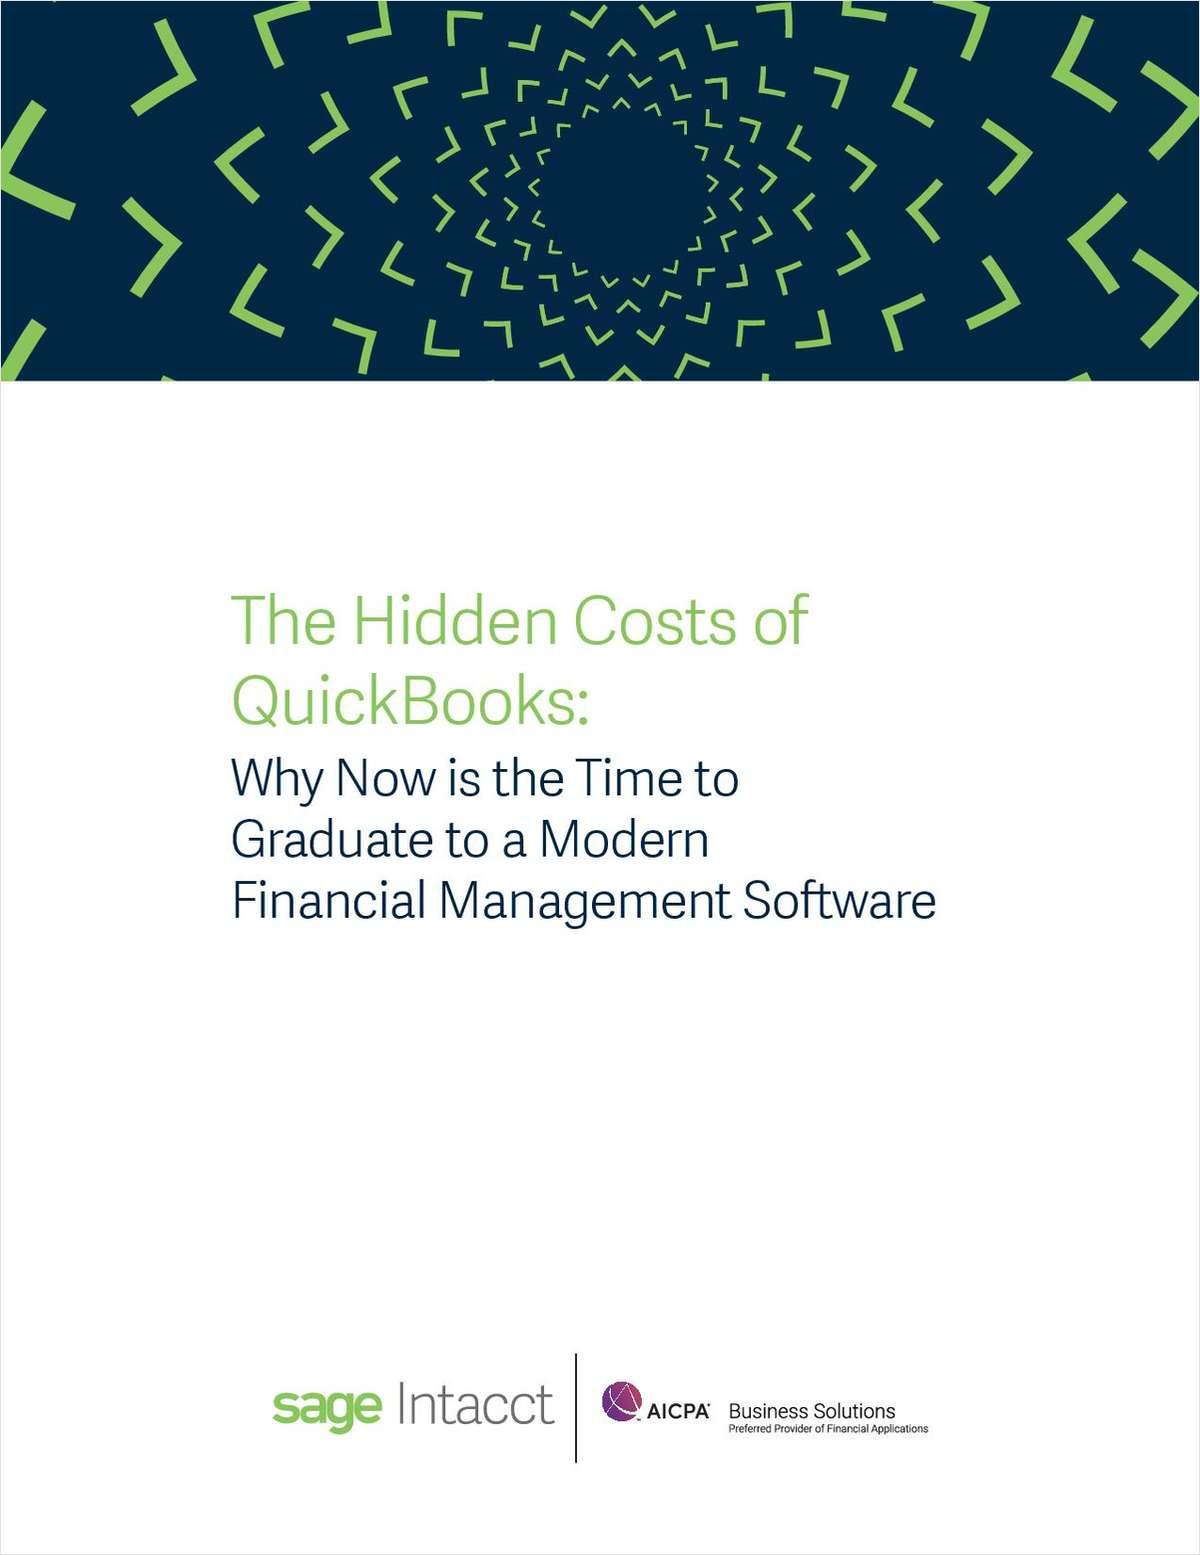 The Hidden Cost of QuickBooks